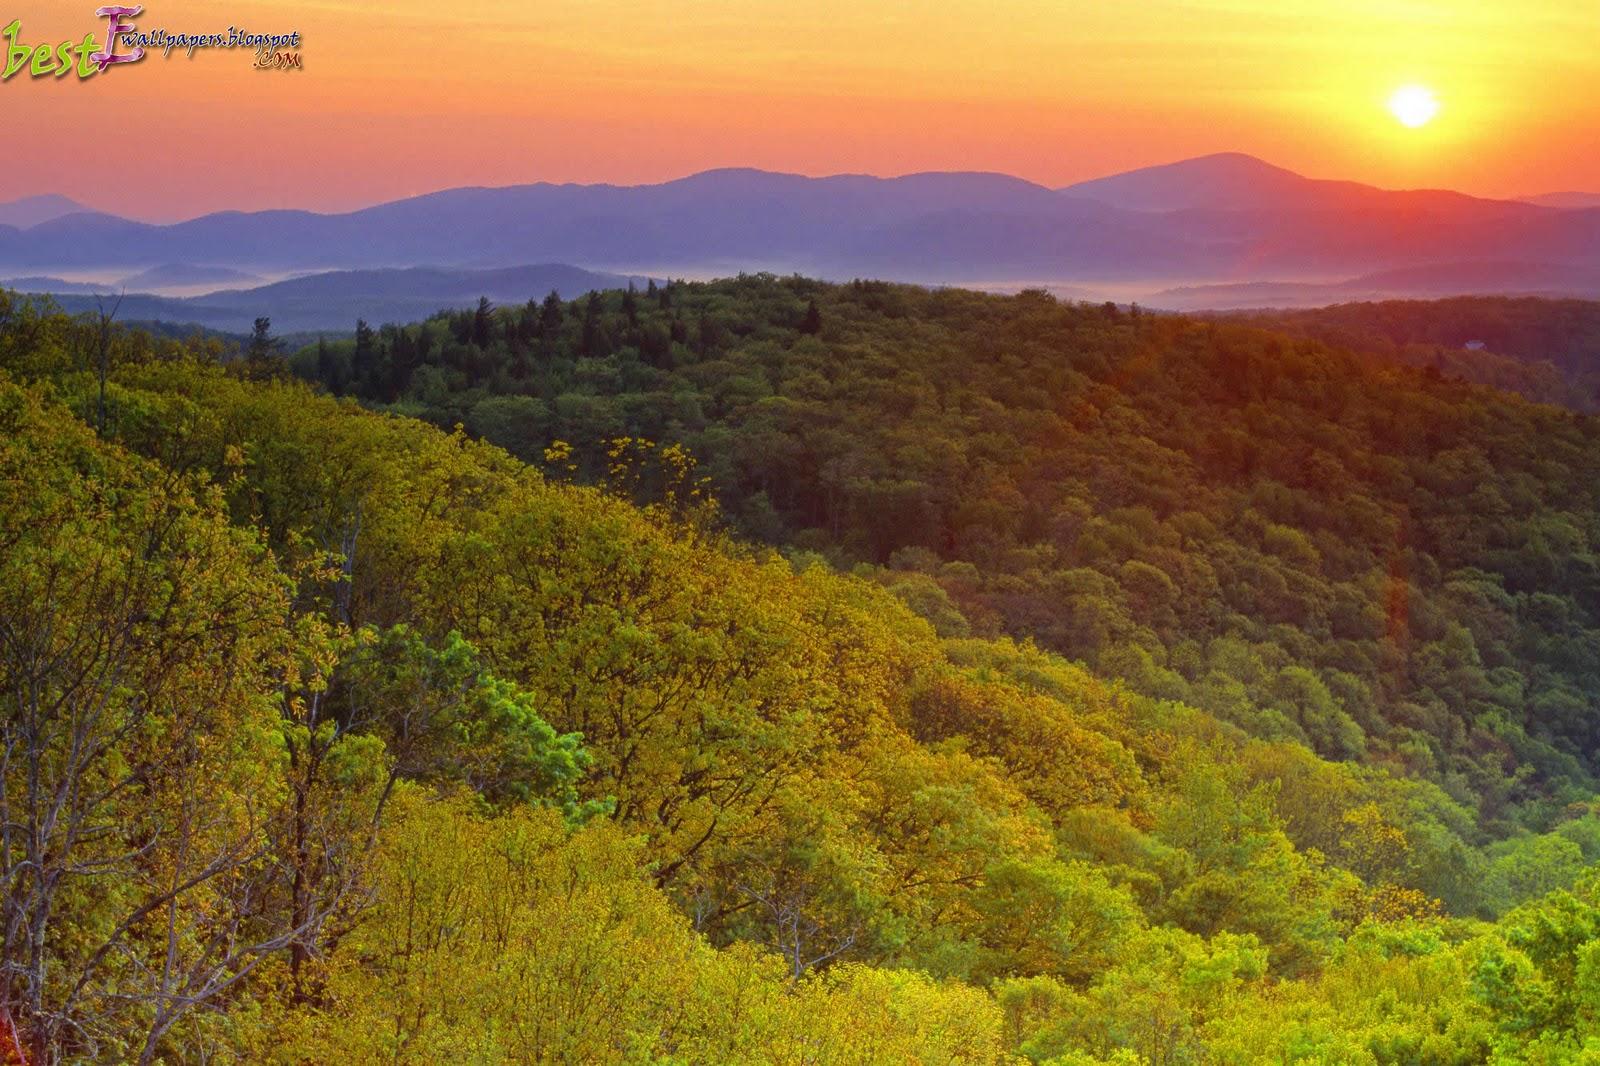 Best sunset wallpapers background best wallpapers - Nature ke wallpaper ...